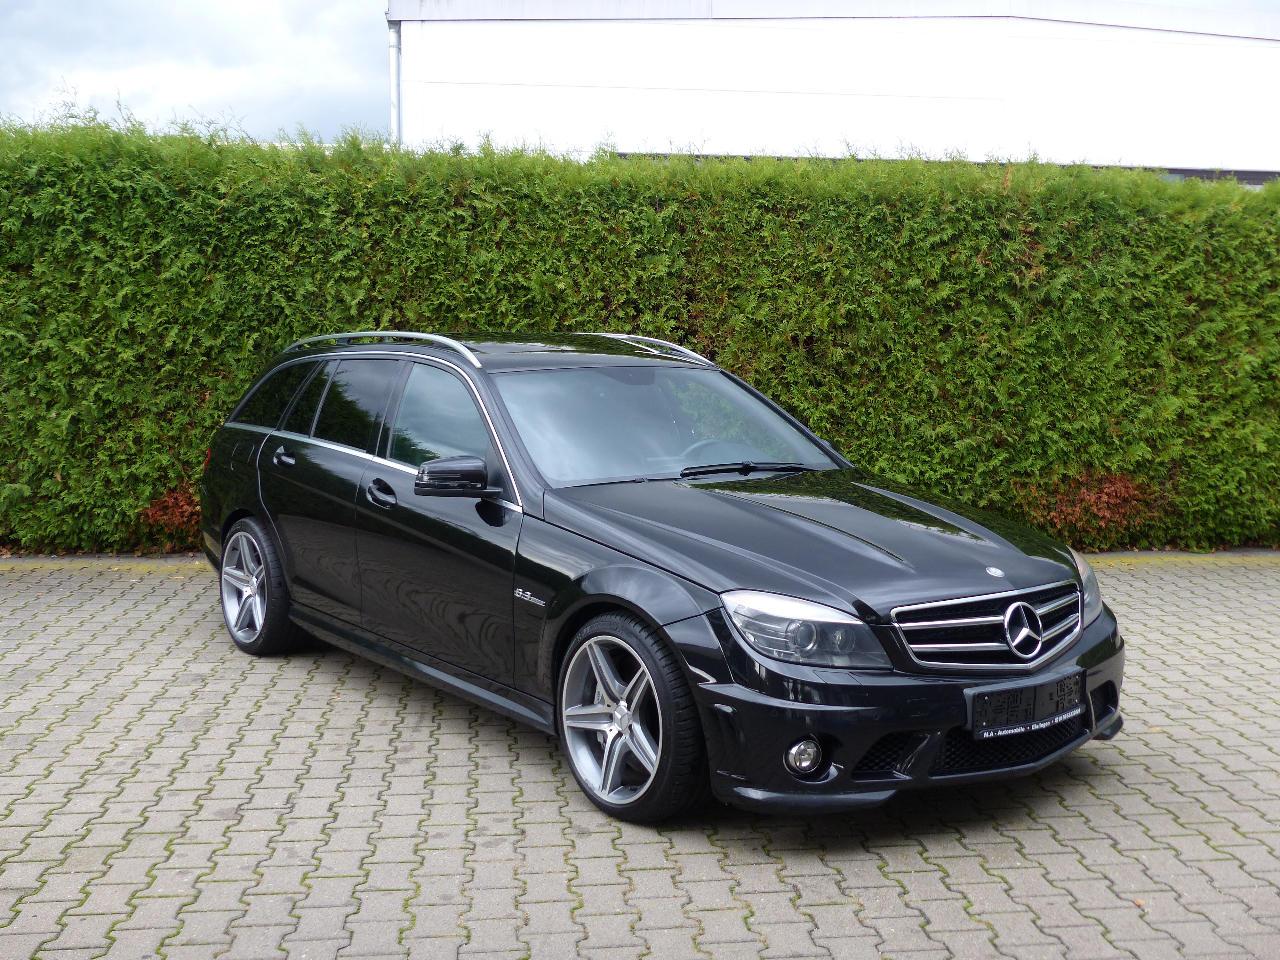 Za cenu Octavie je tento Mercedes AMG s 550 koňmi!